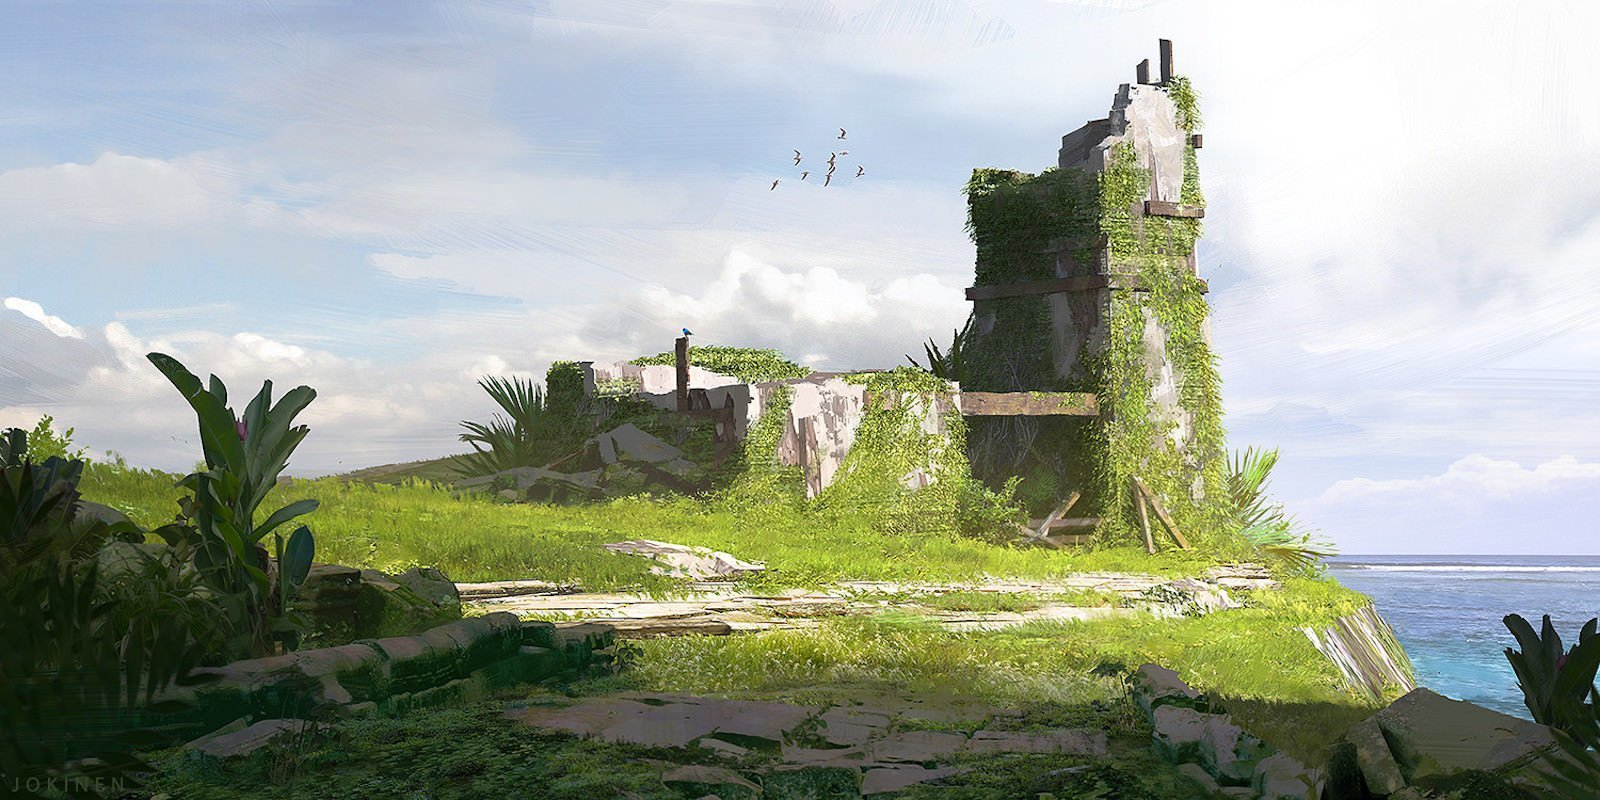 Watchtower искусство, картины, рисунки, юхани йокинен